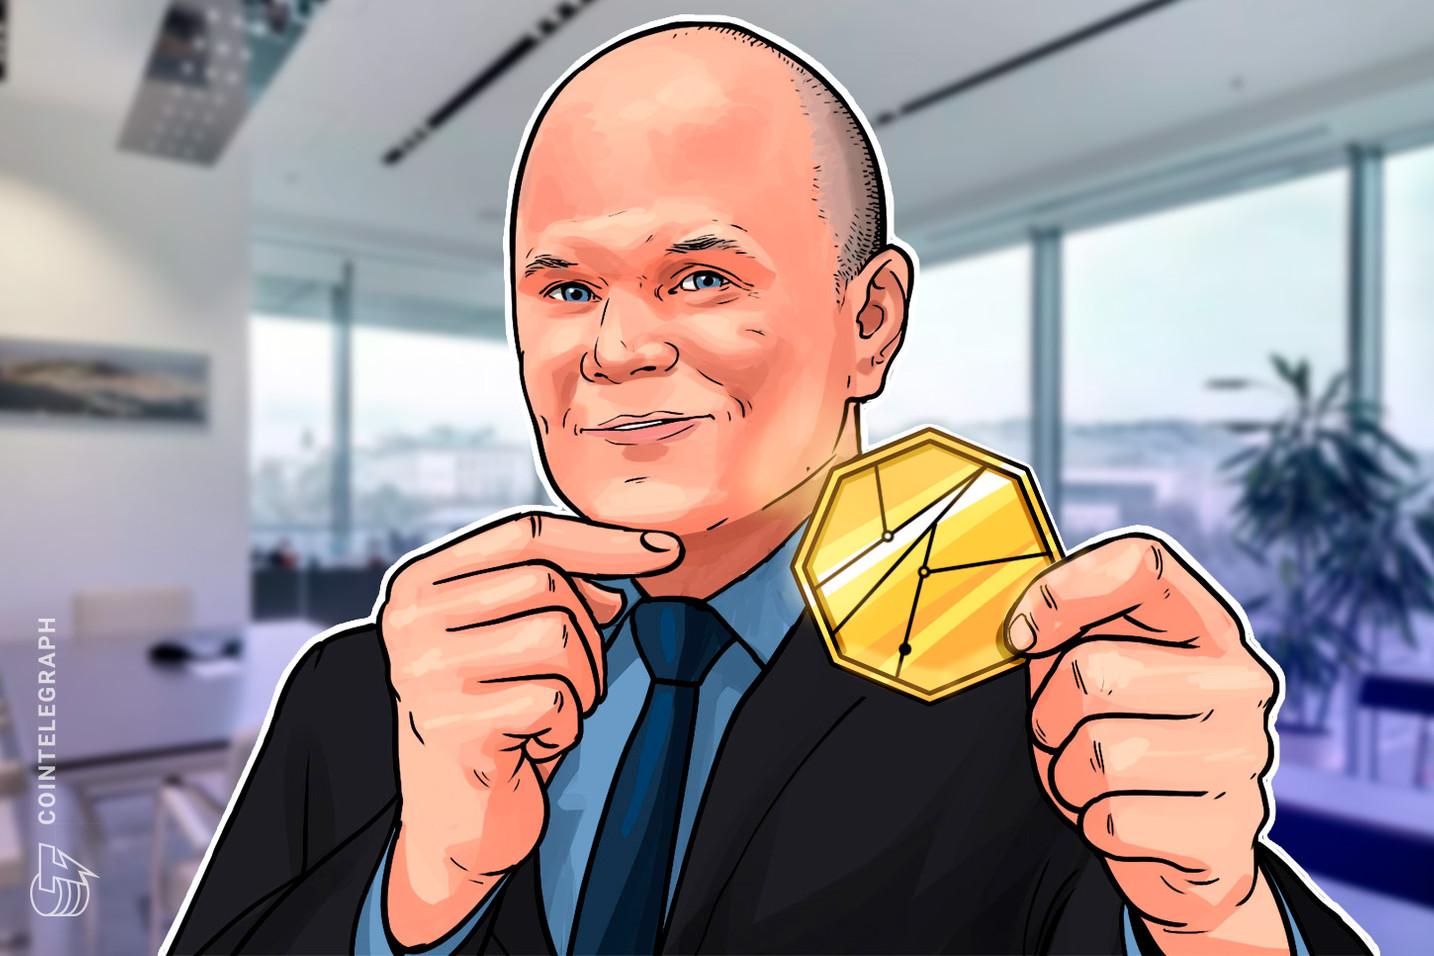 Galaxy Digital Founder Michael Novogratz: One of the Social Media Cryptos Will Succeed